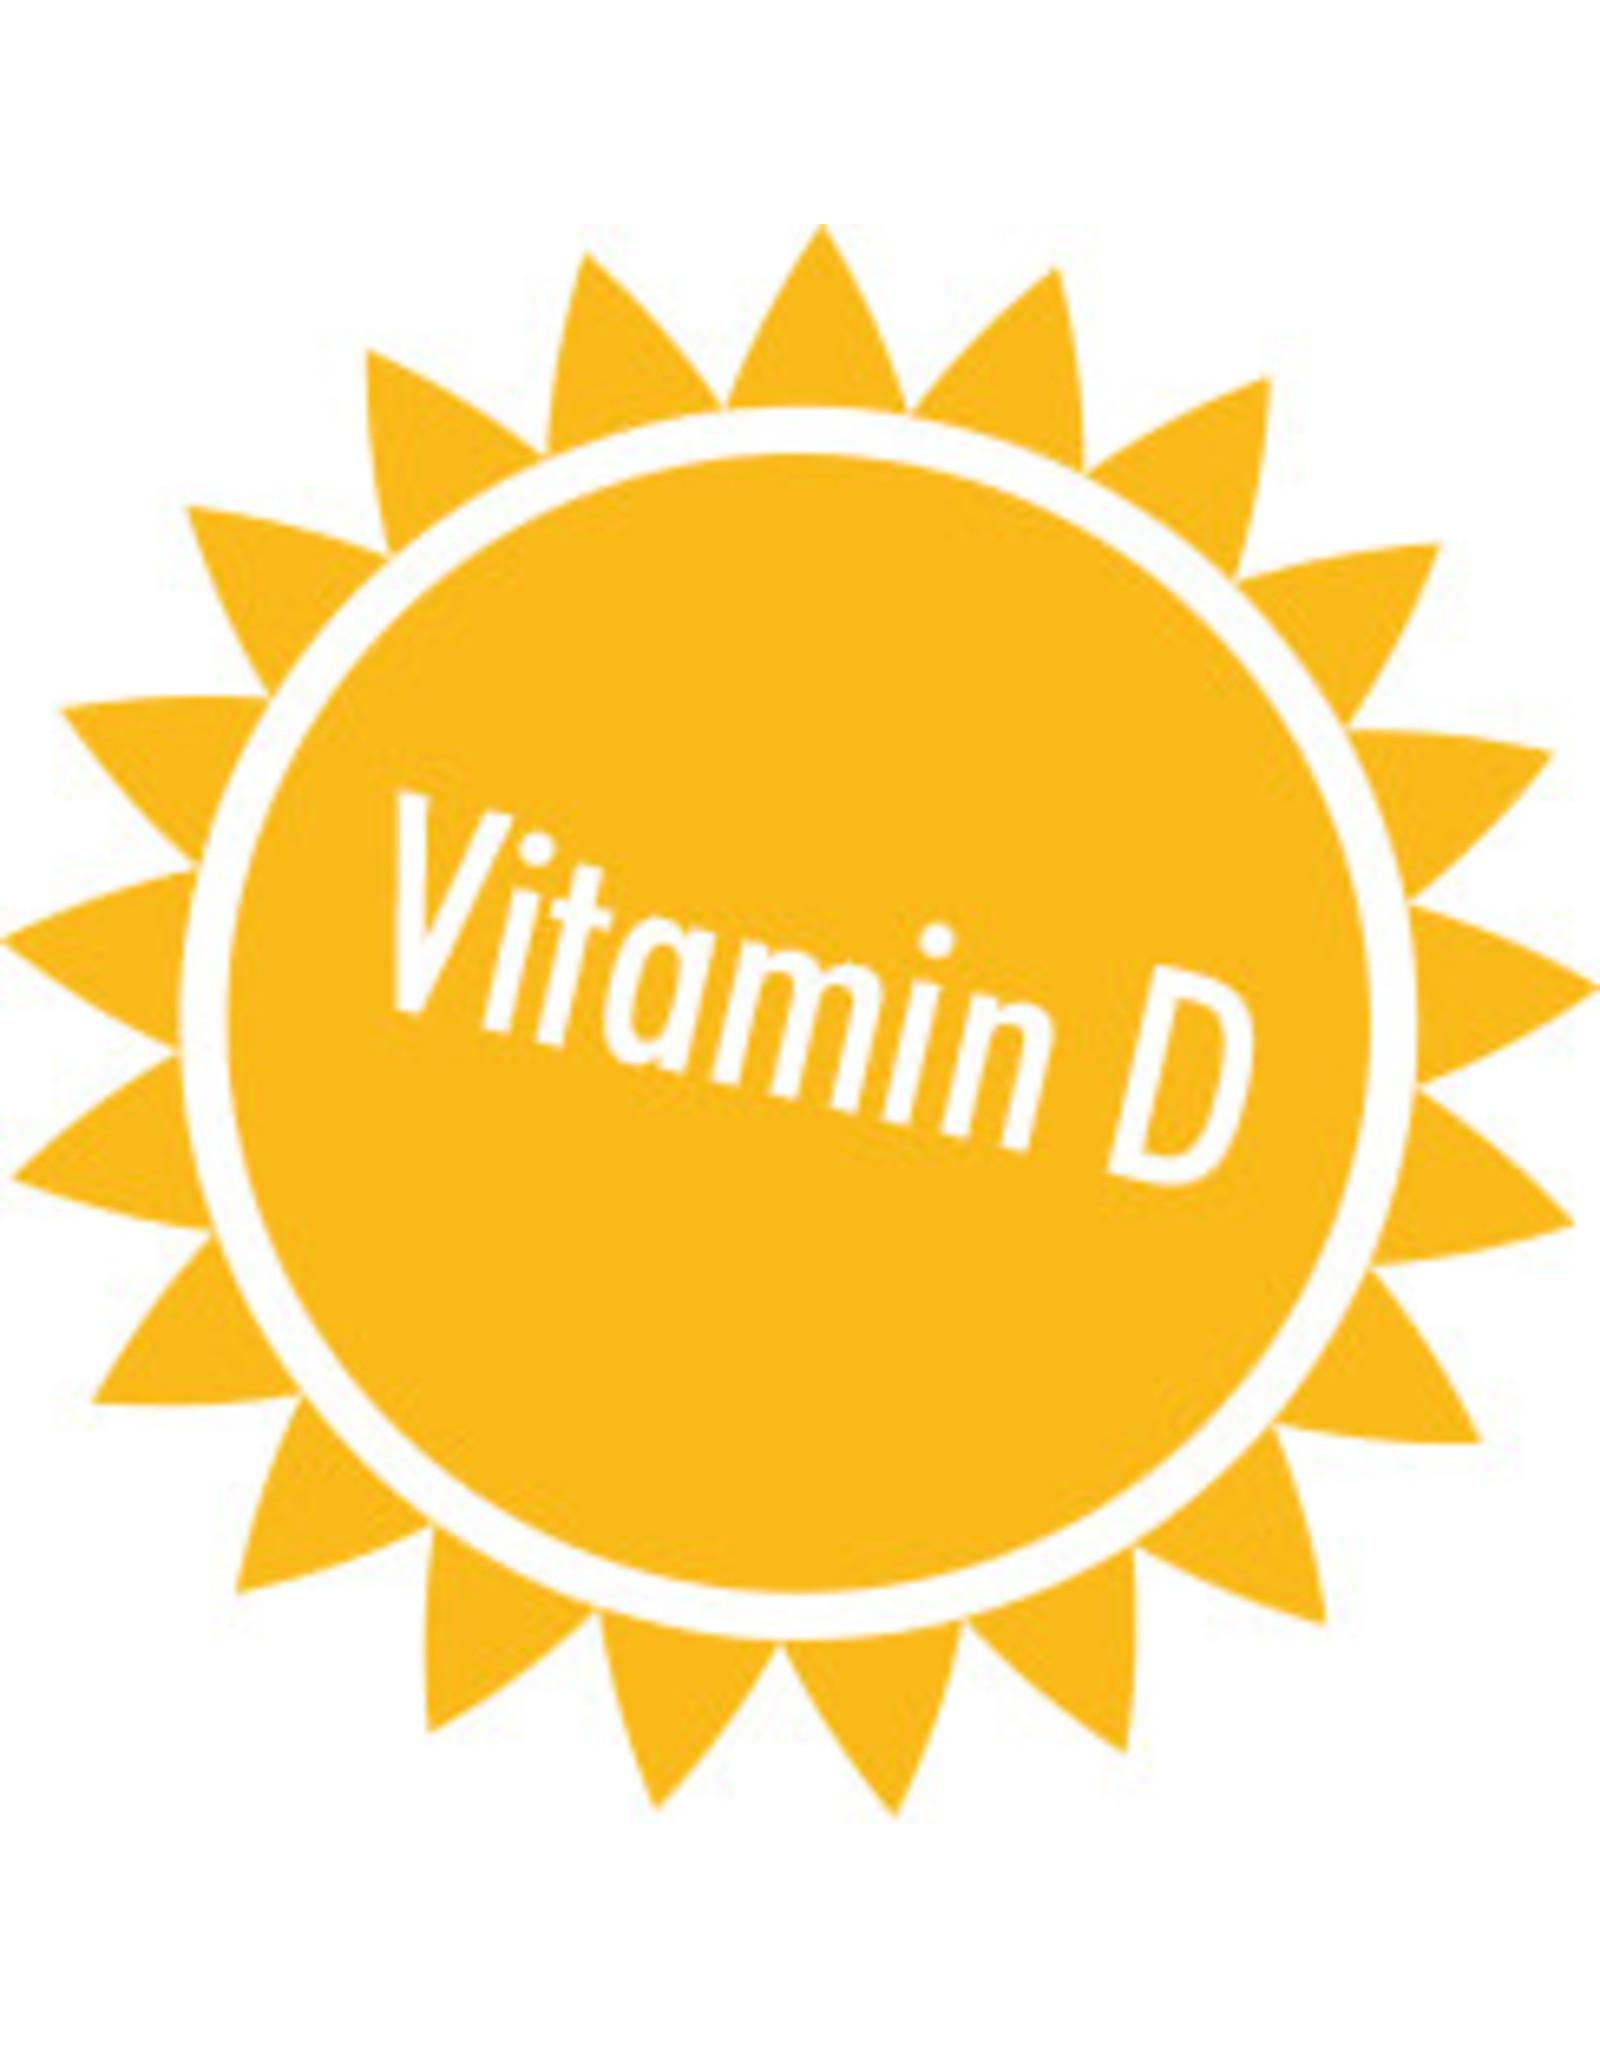 Vitaminie D  - Body & Soap